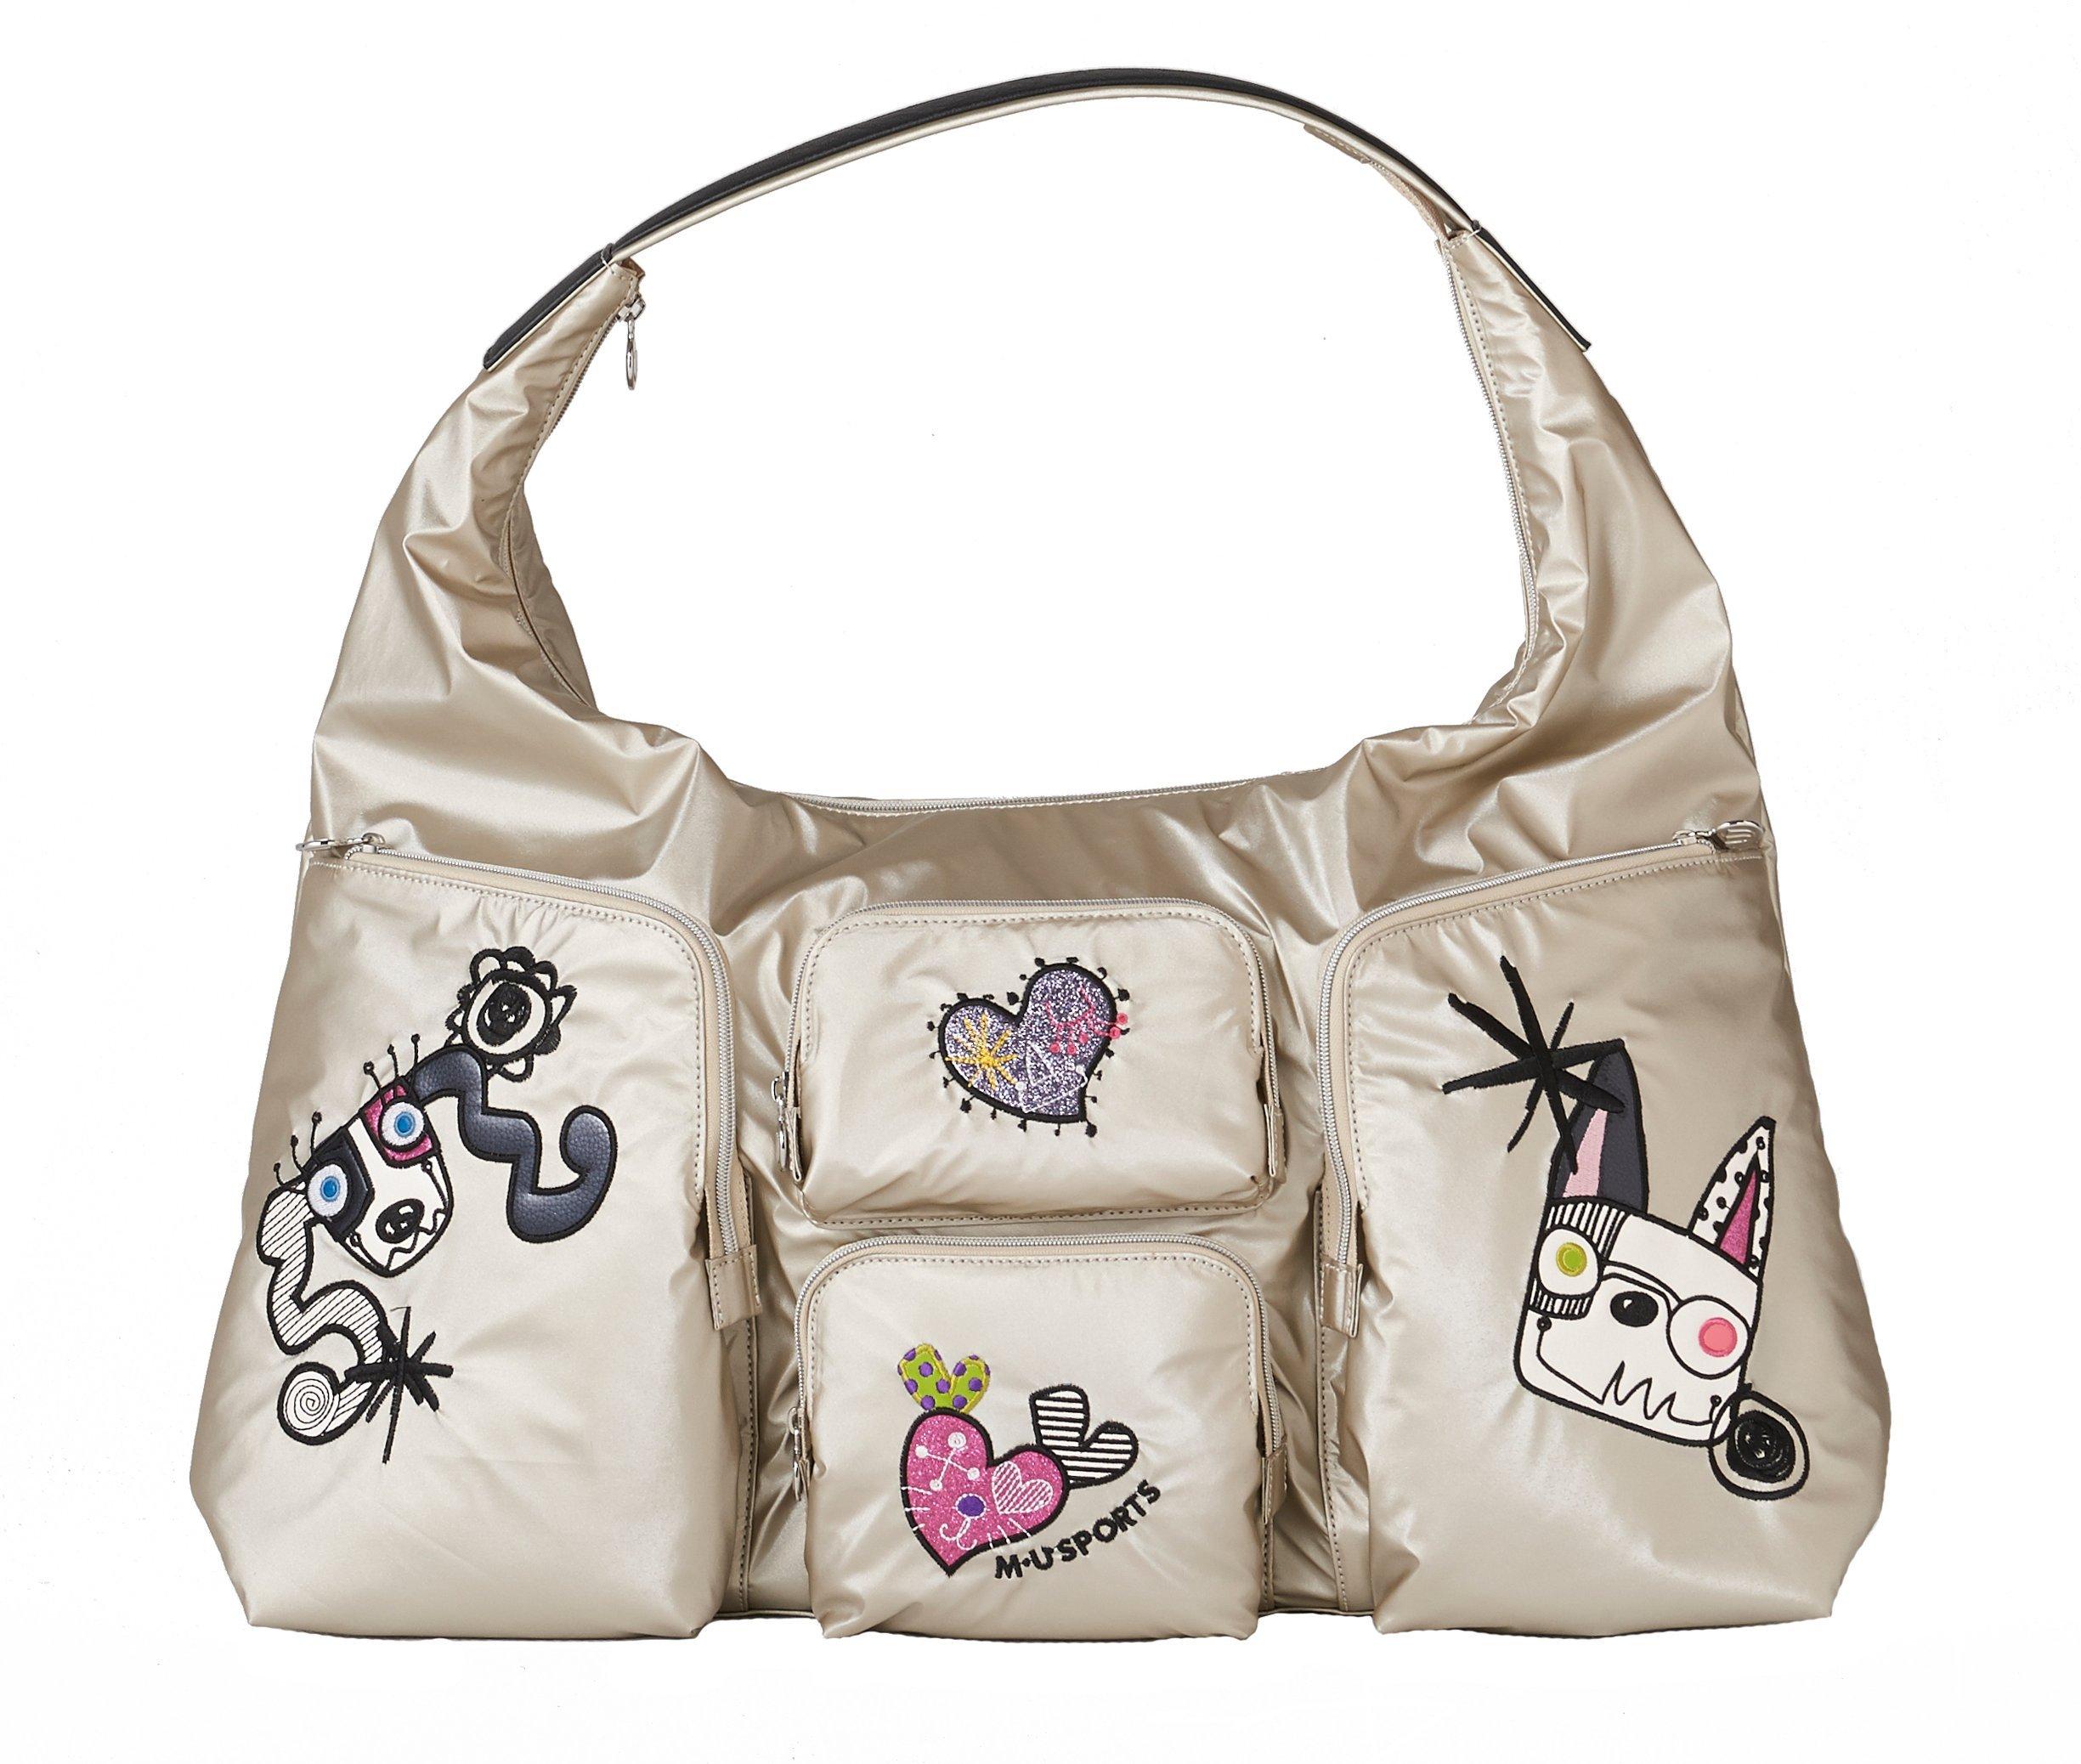 MU Sports Ladies Boston Bag, Gold, 703Q1200